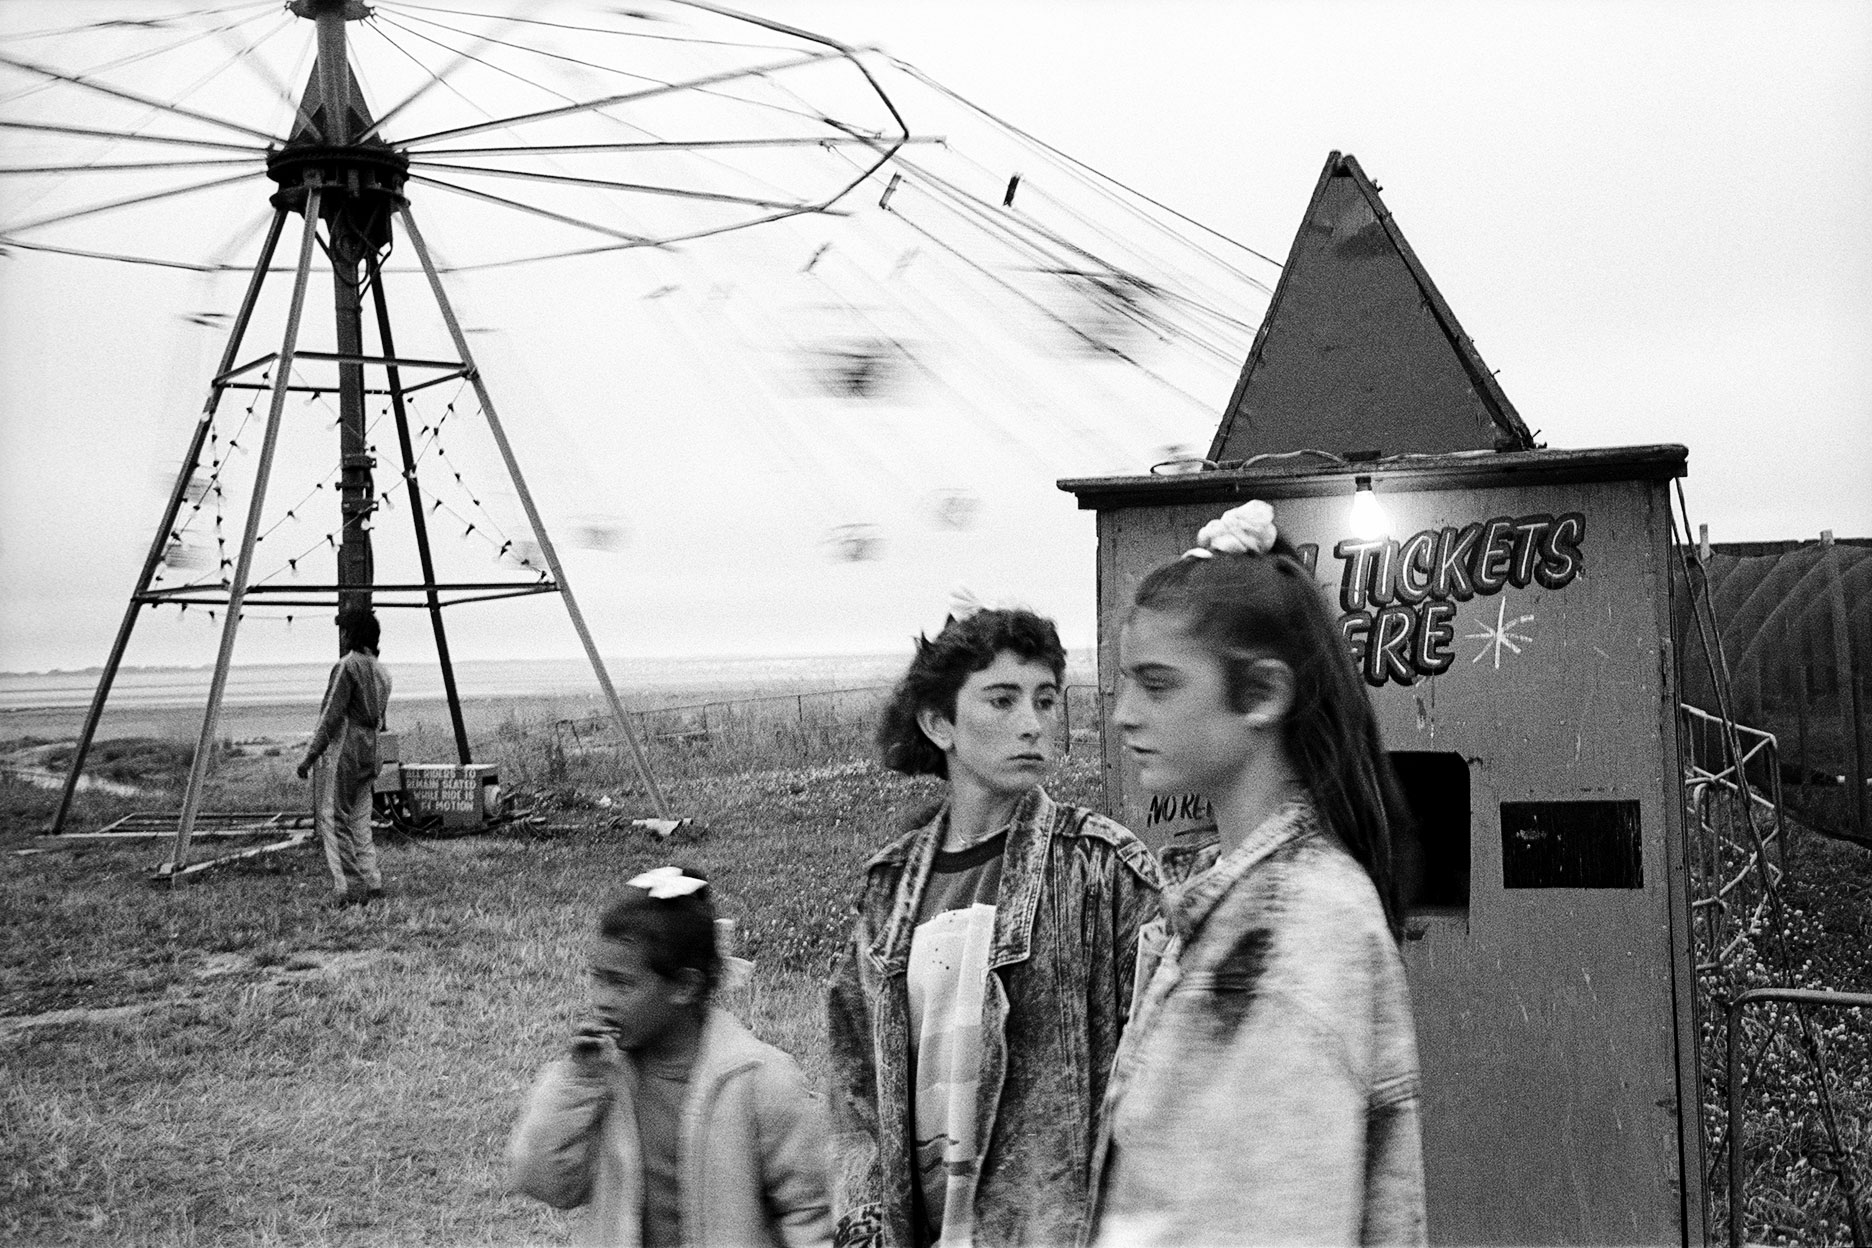 Carnival, Riverton, 1Southland, 1989